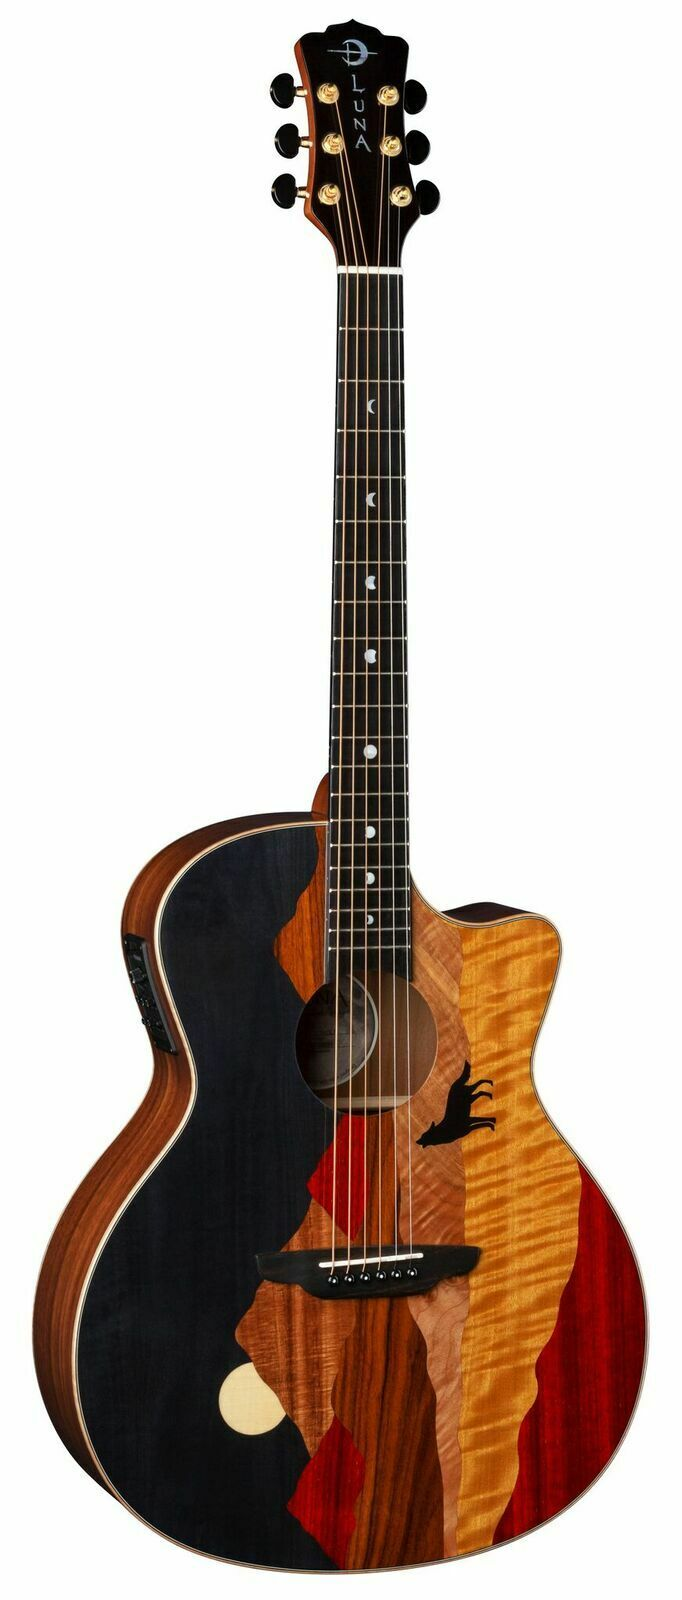 New Luna Vista Wolf Tropical Wood A E Guitar w case- Free Shipping